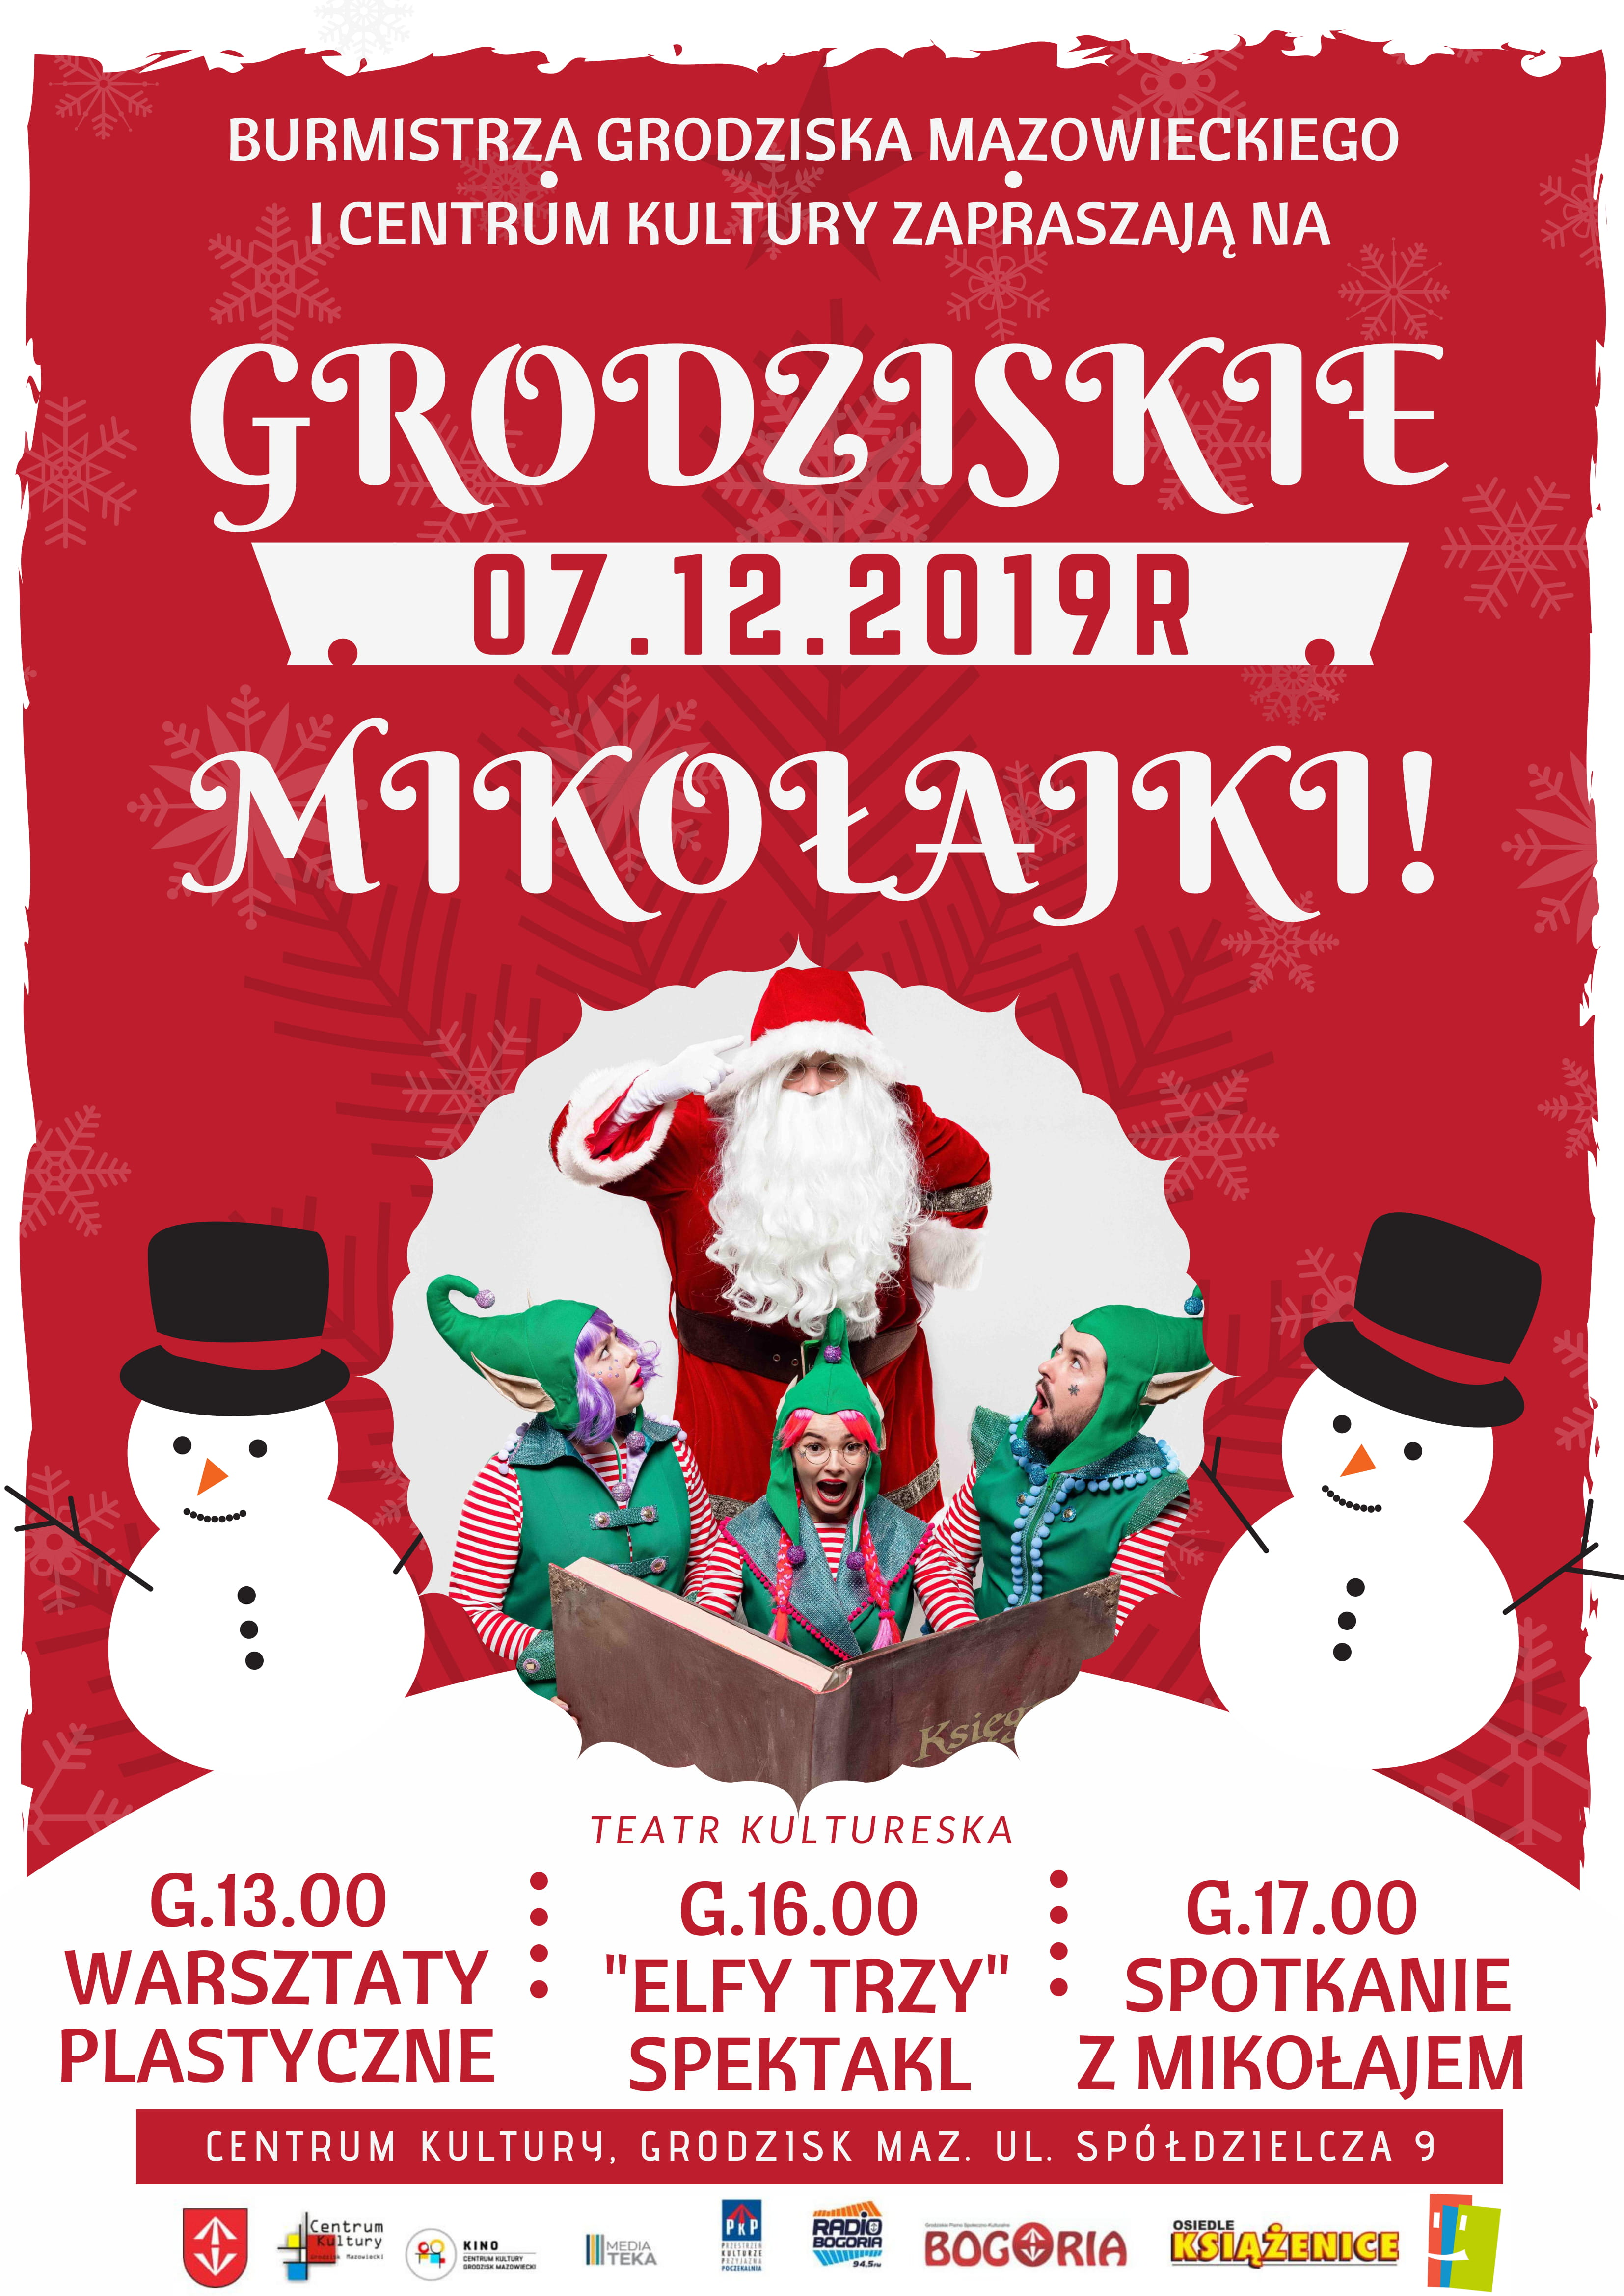 pliki/ckg/grafika/Artykuly/2019/Wrzesien/mikolajki (2)-1.jpg